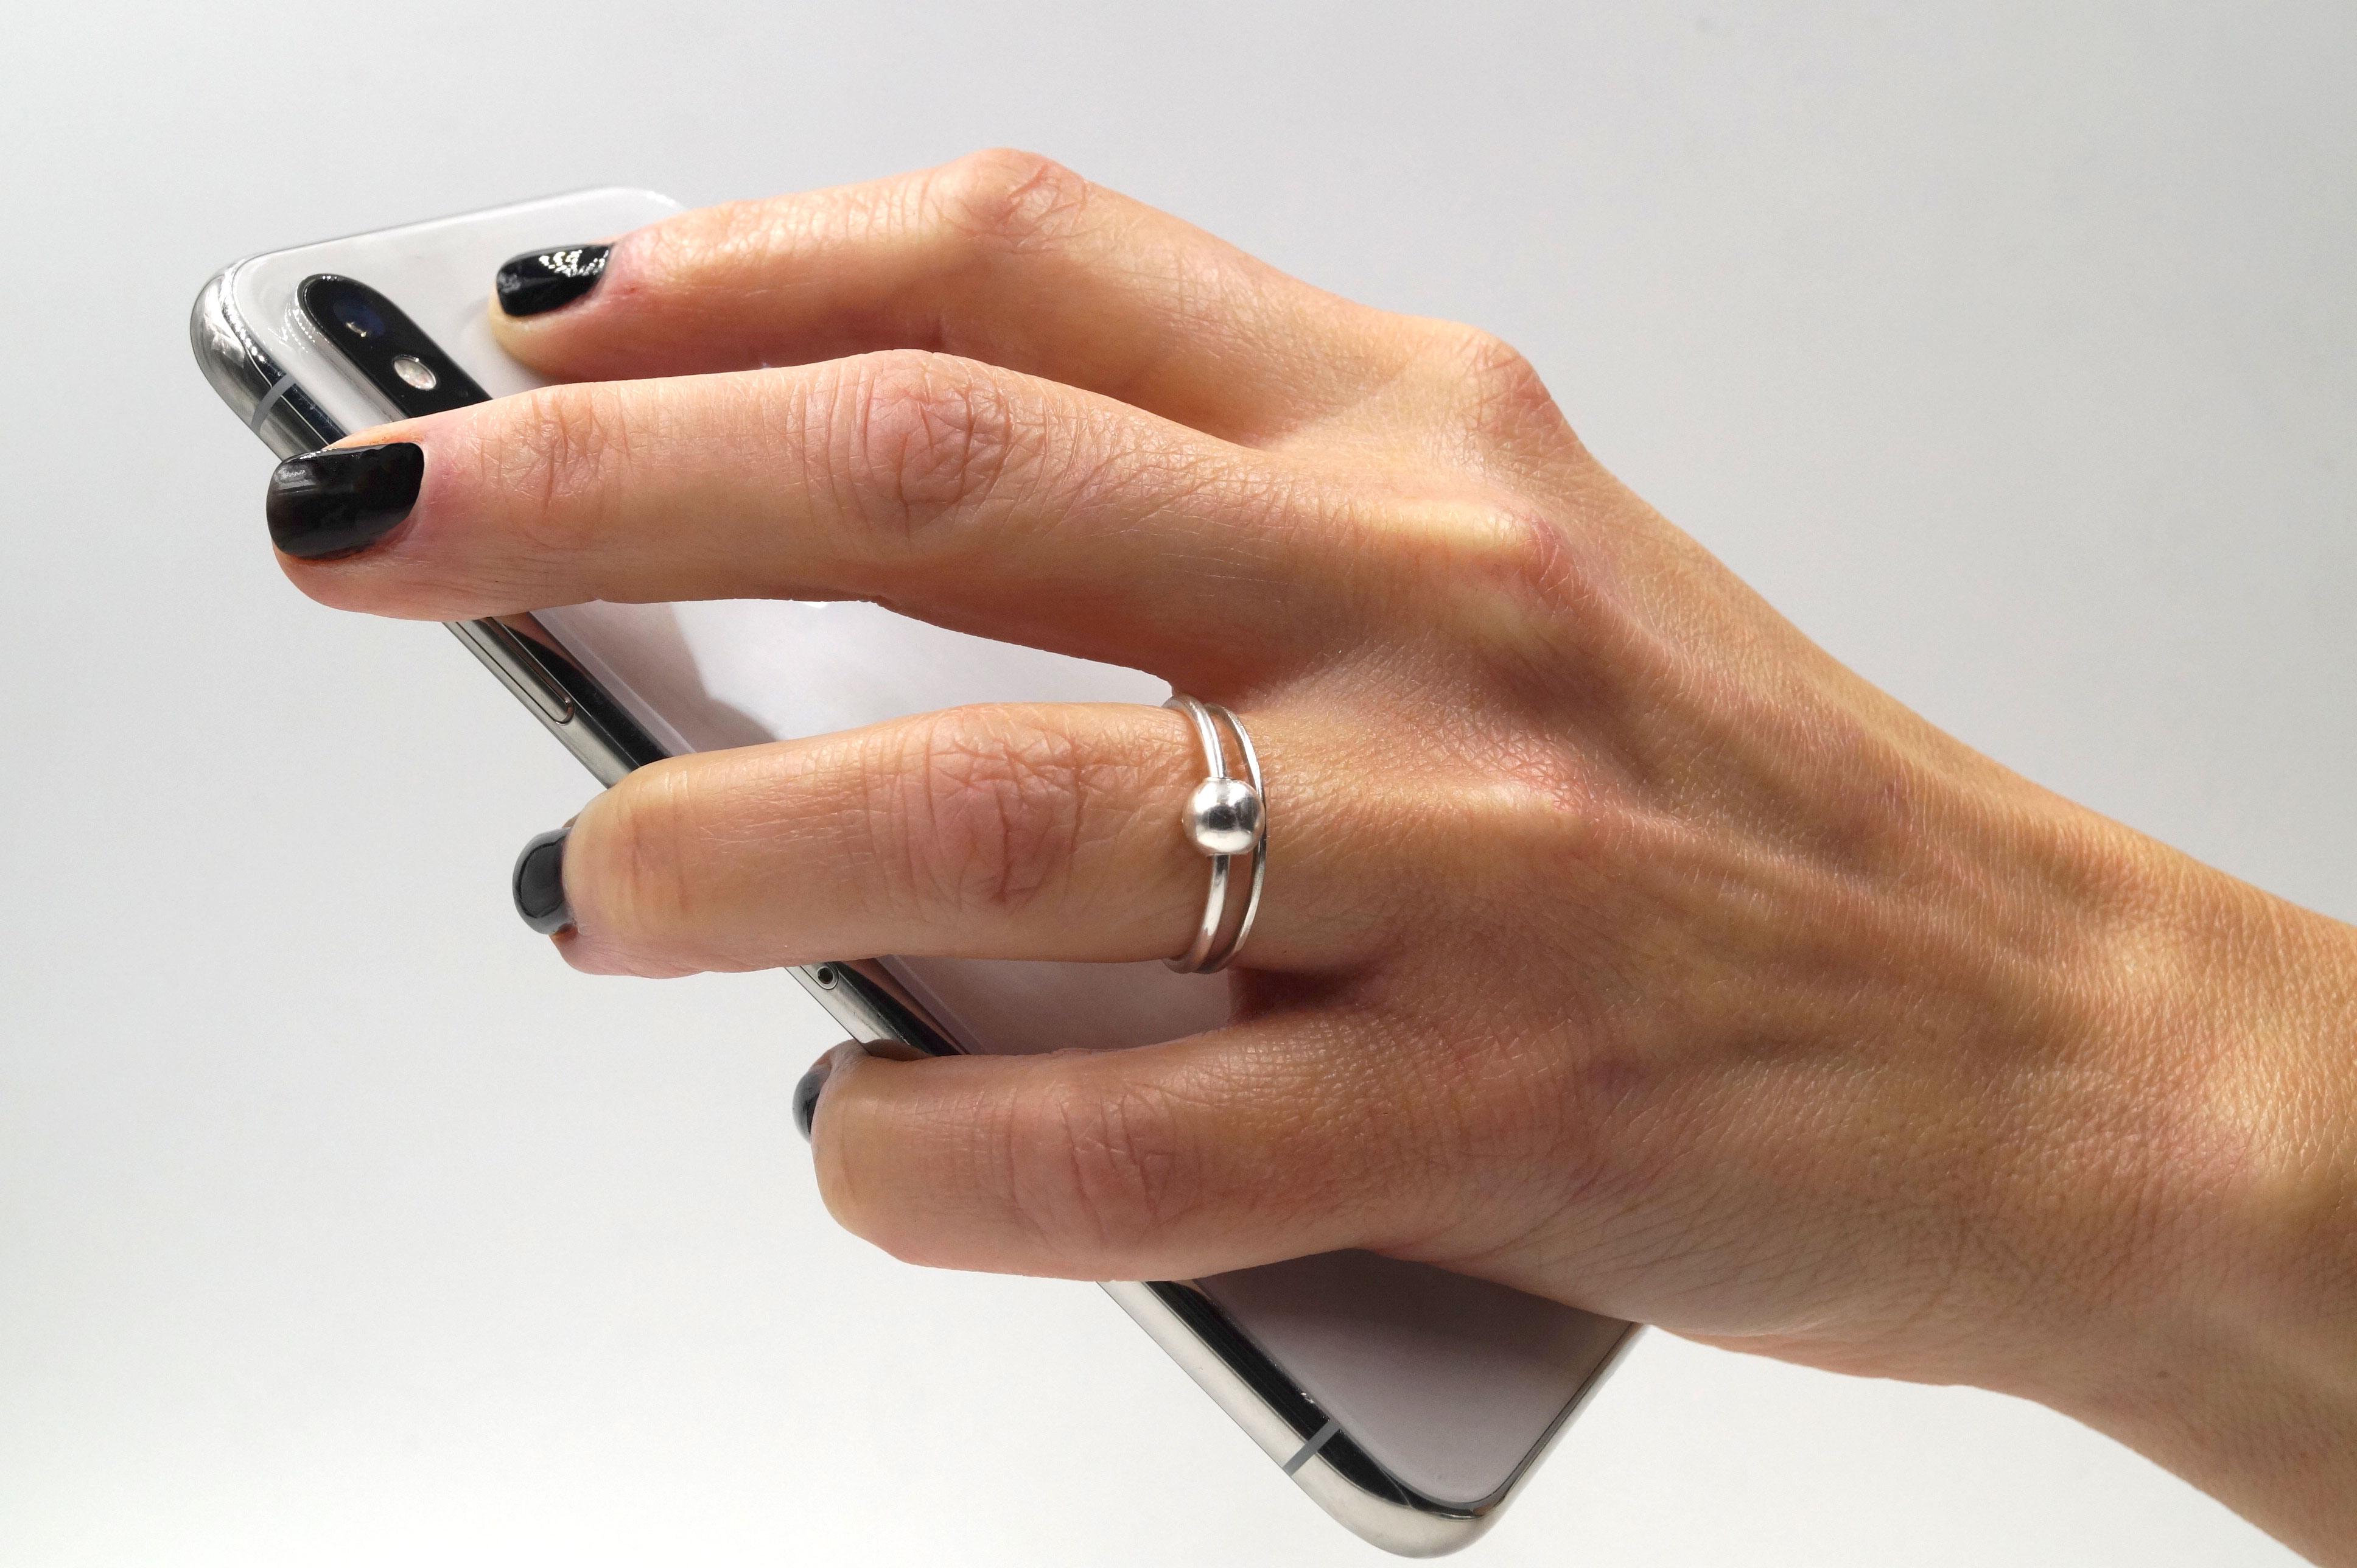 ball-hand-phone.jpg